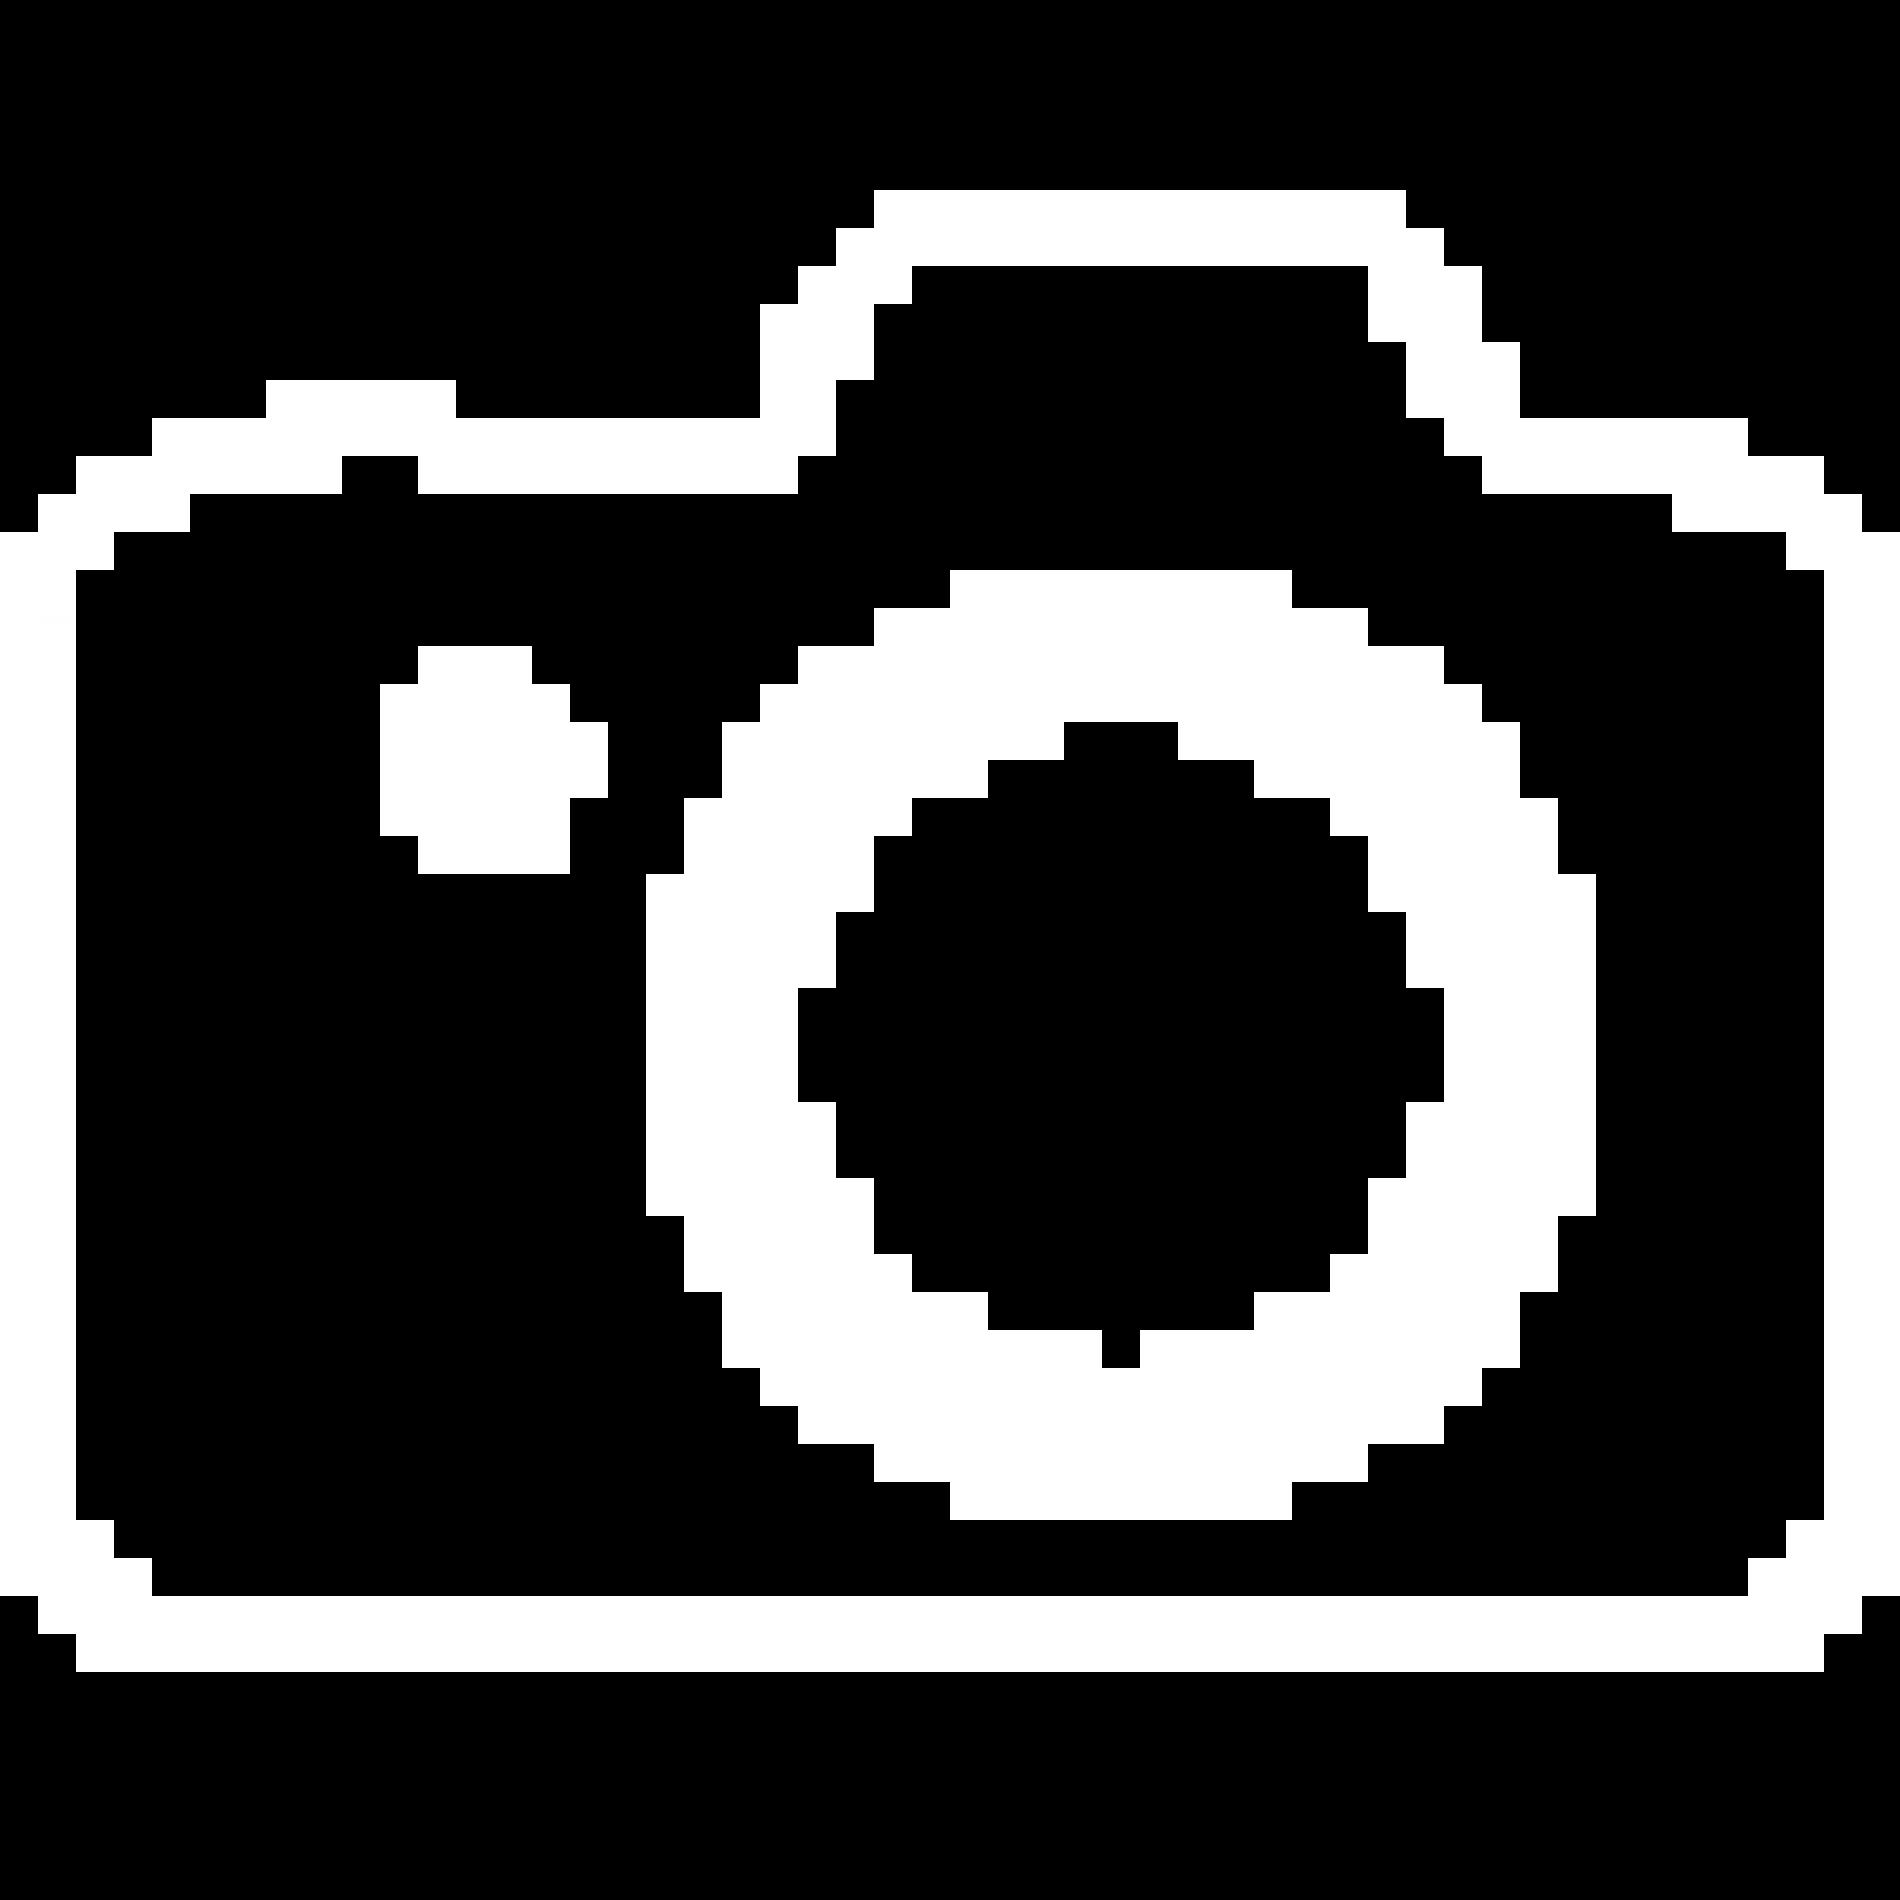 imagen-y-video